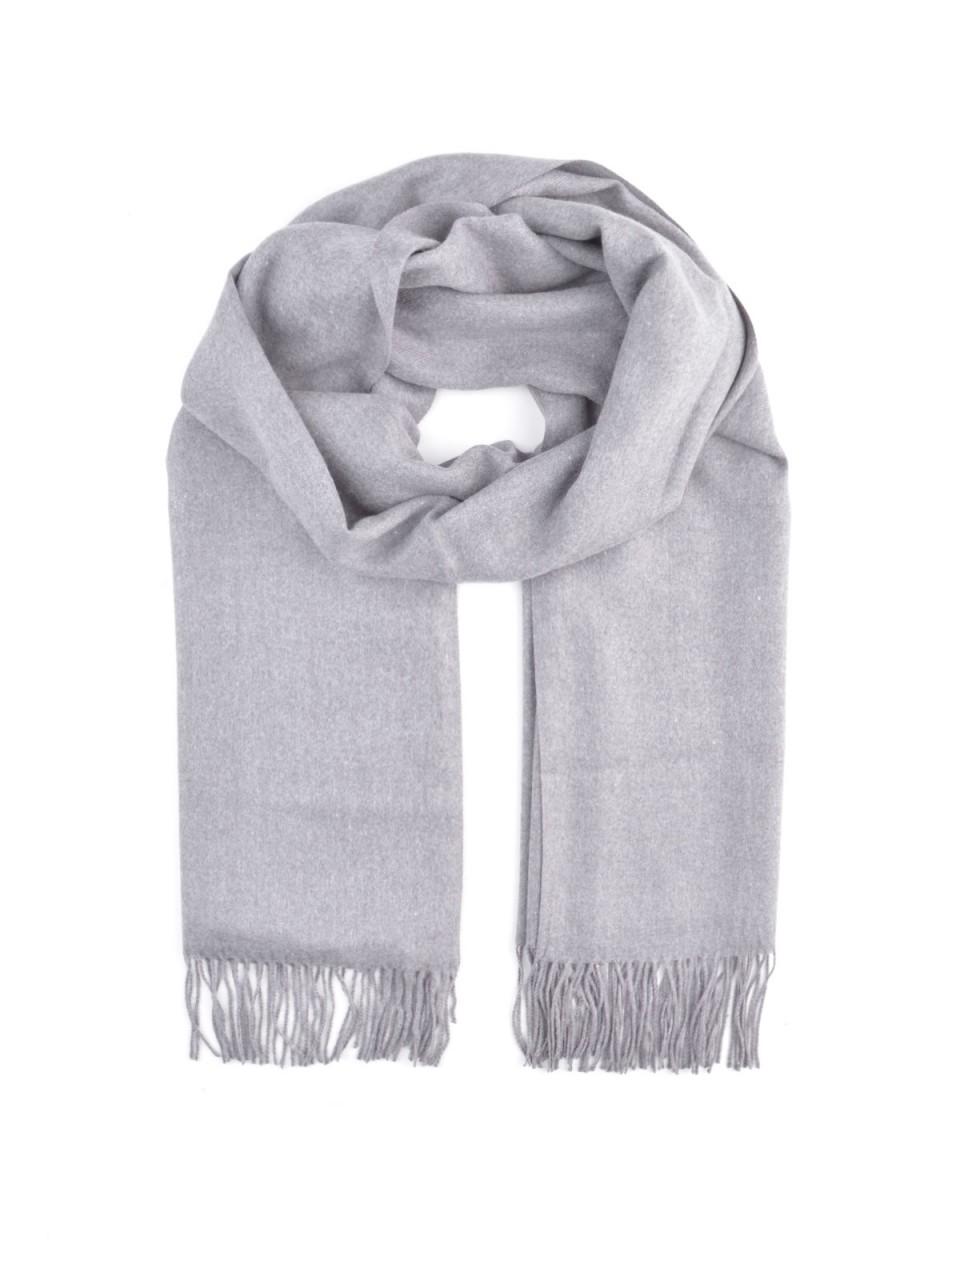 Schals - MILANO ITALY Damen Schal, grau  - Onlineshop Designermode.com